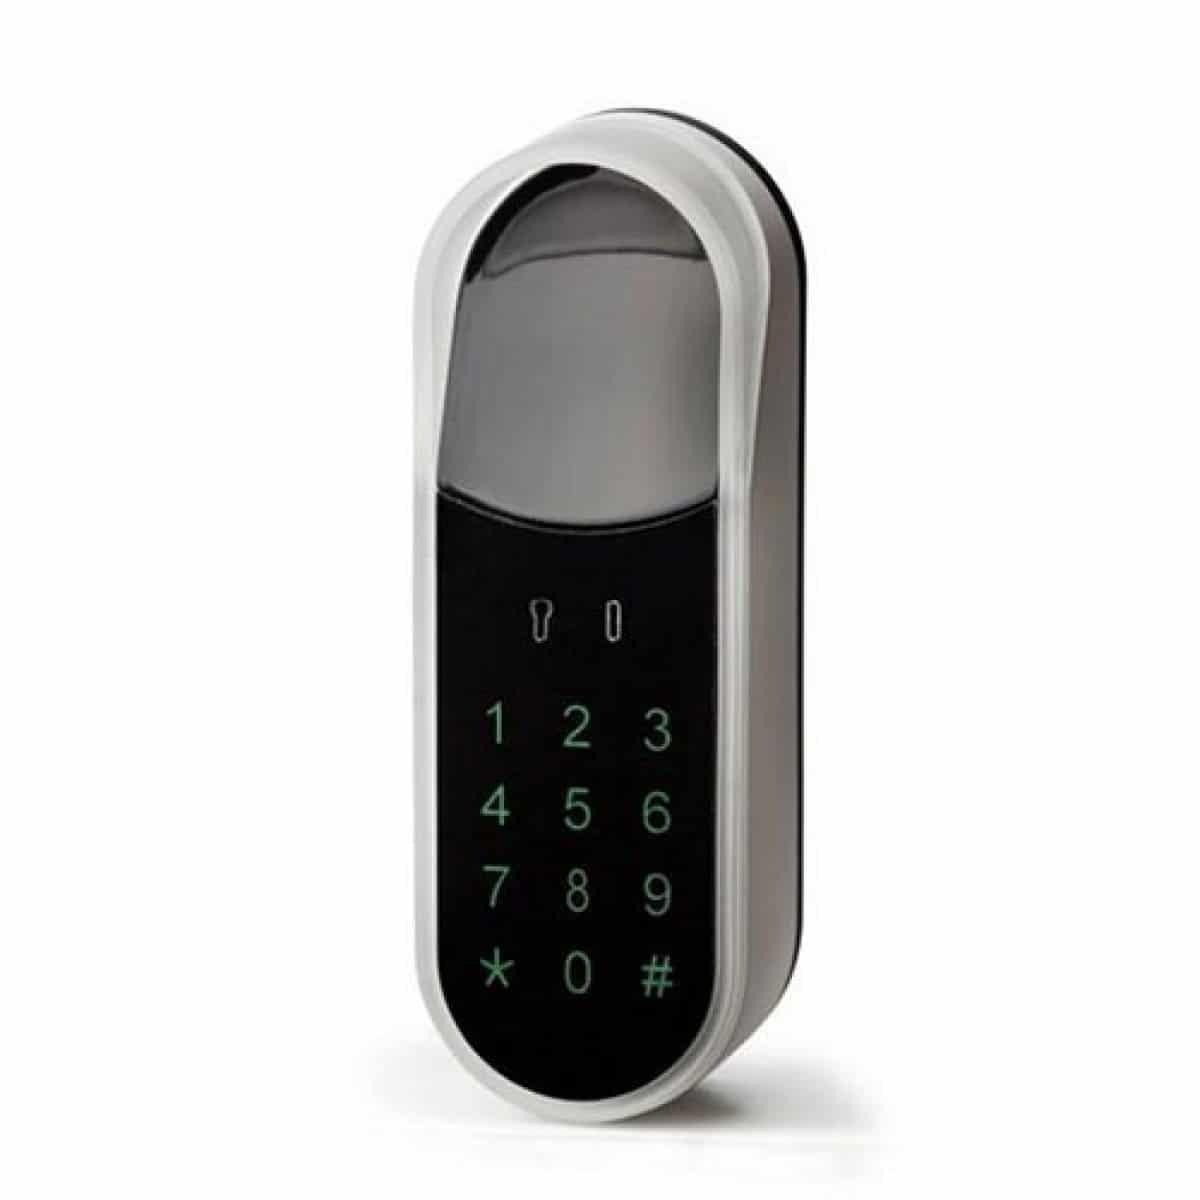 nemef entr pincode, slimme deurslot, smart lock